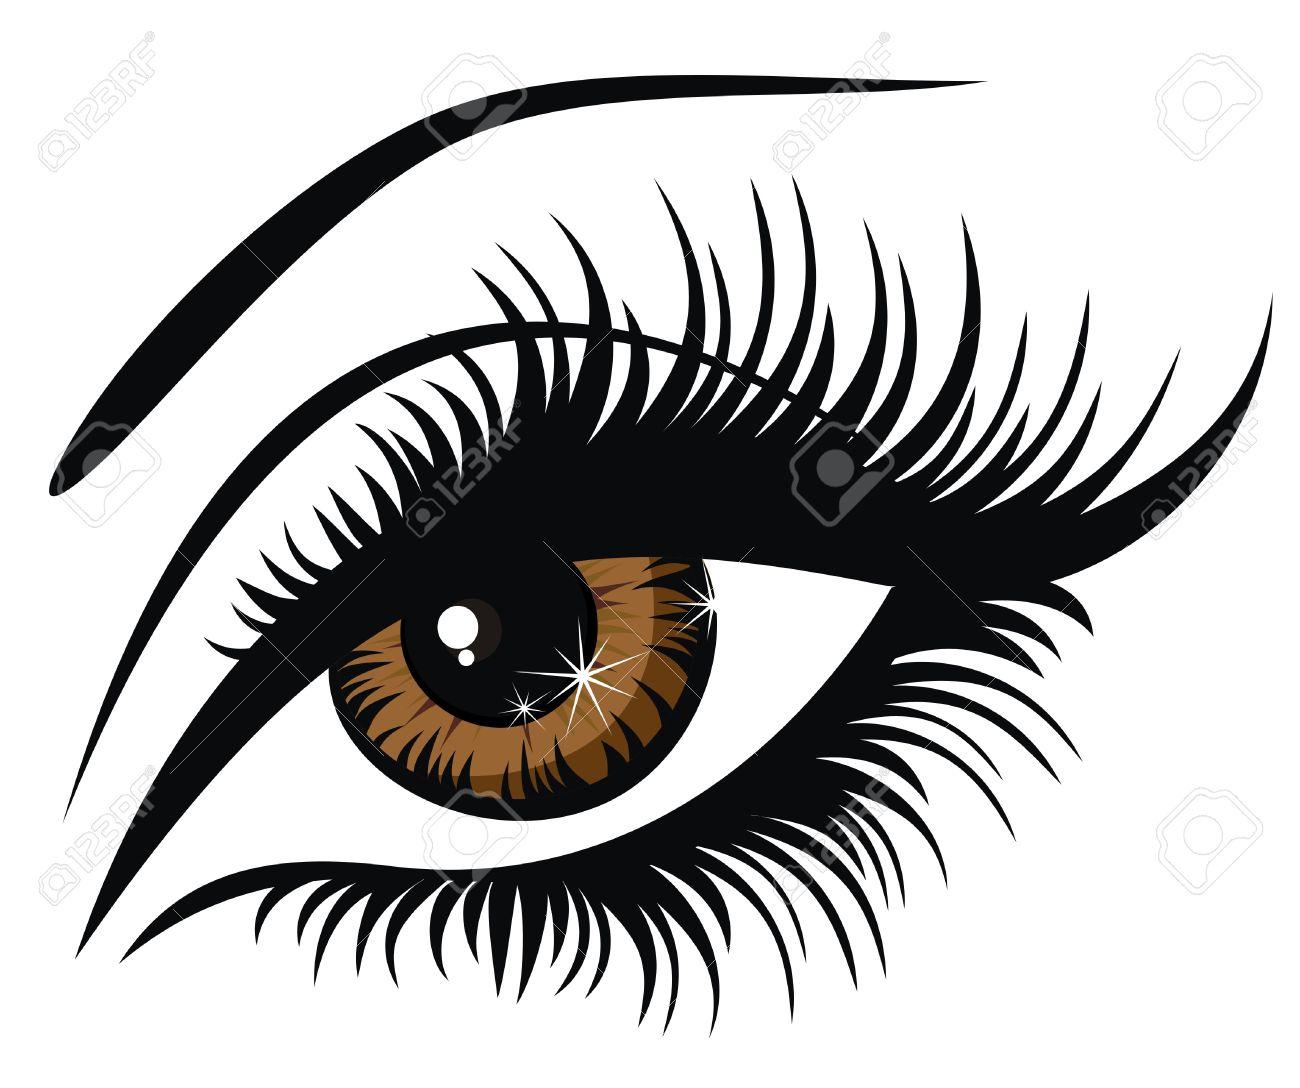 Lashes free download best. Eyelash clipart clip art